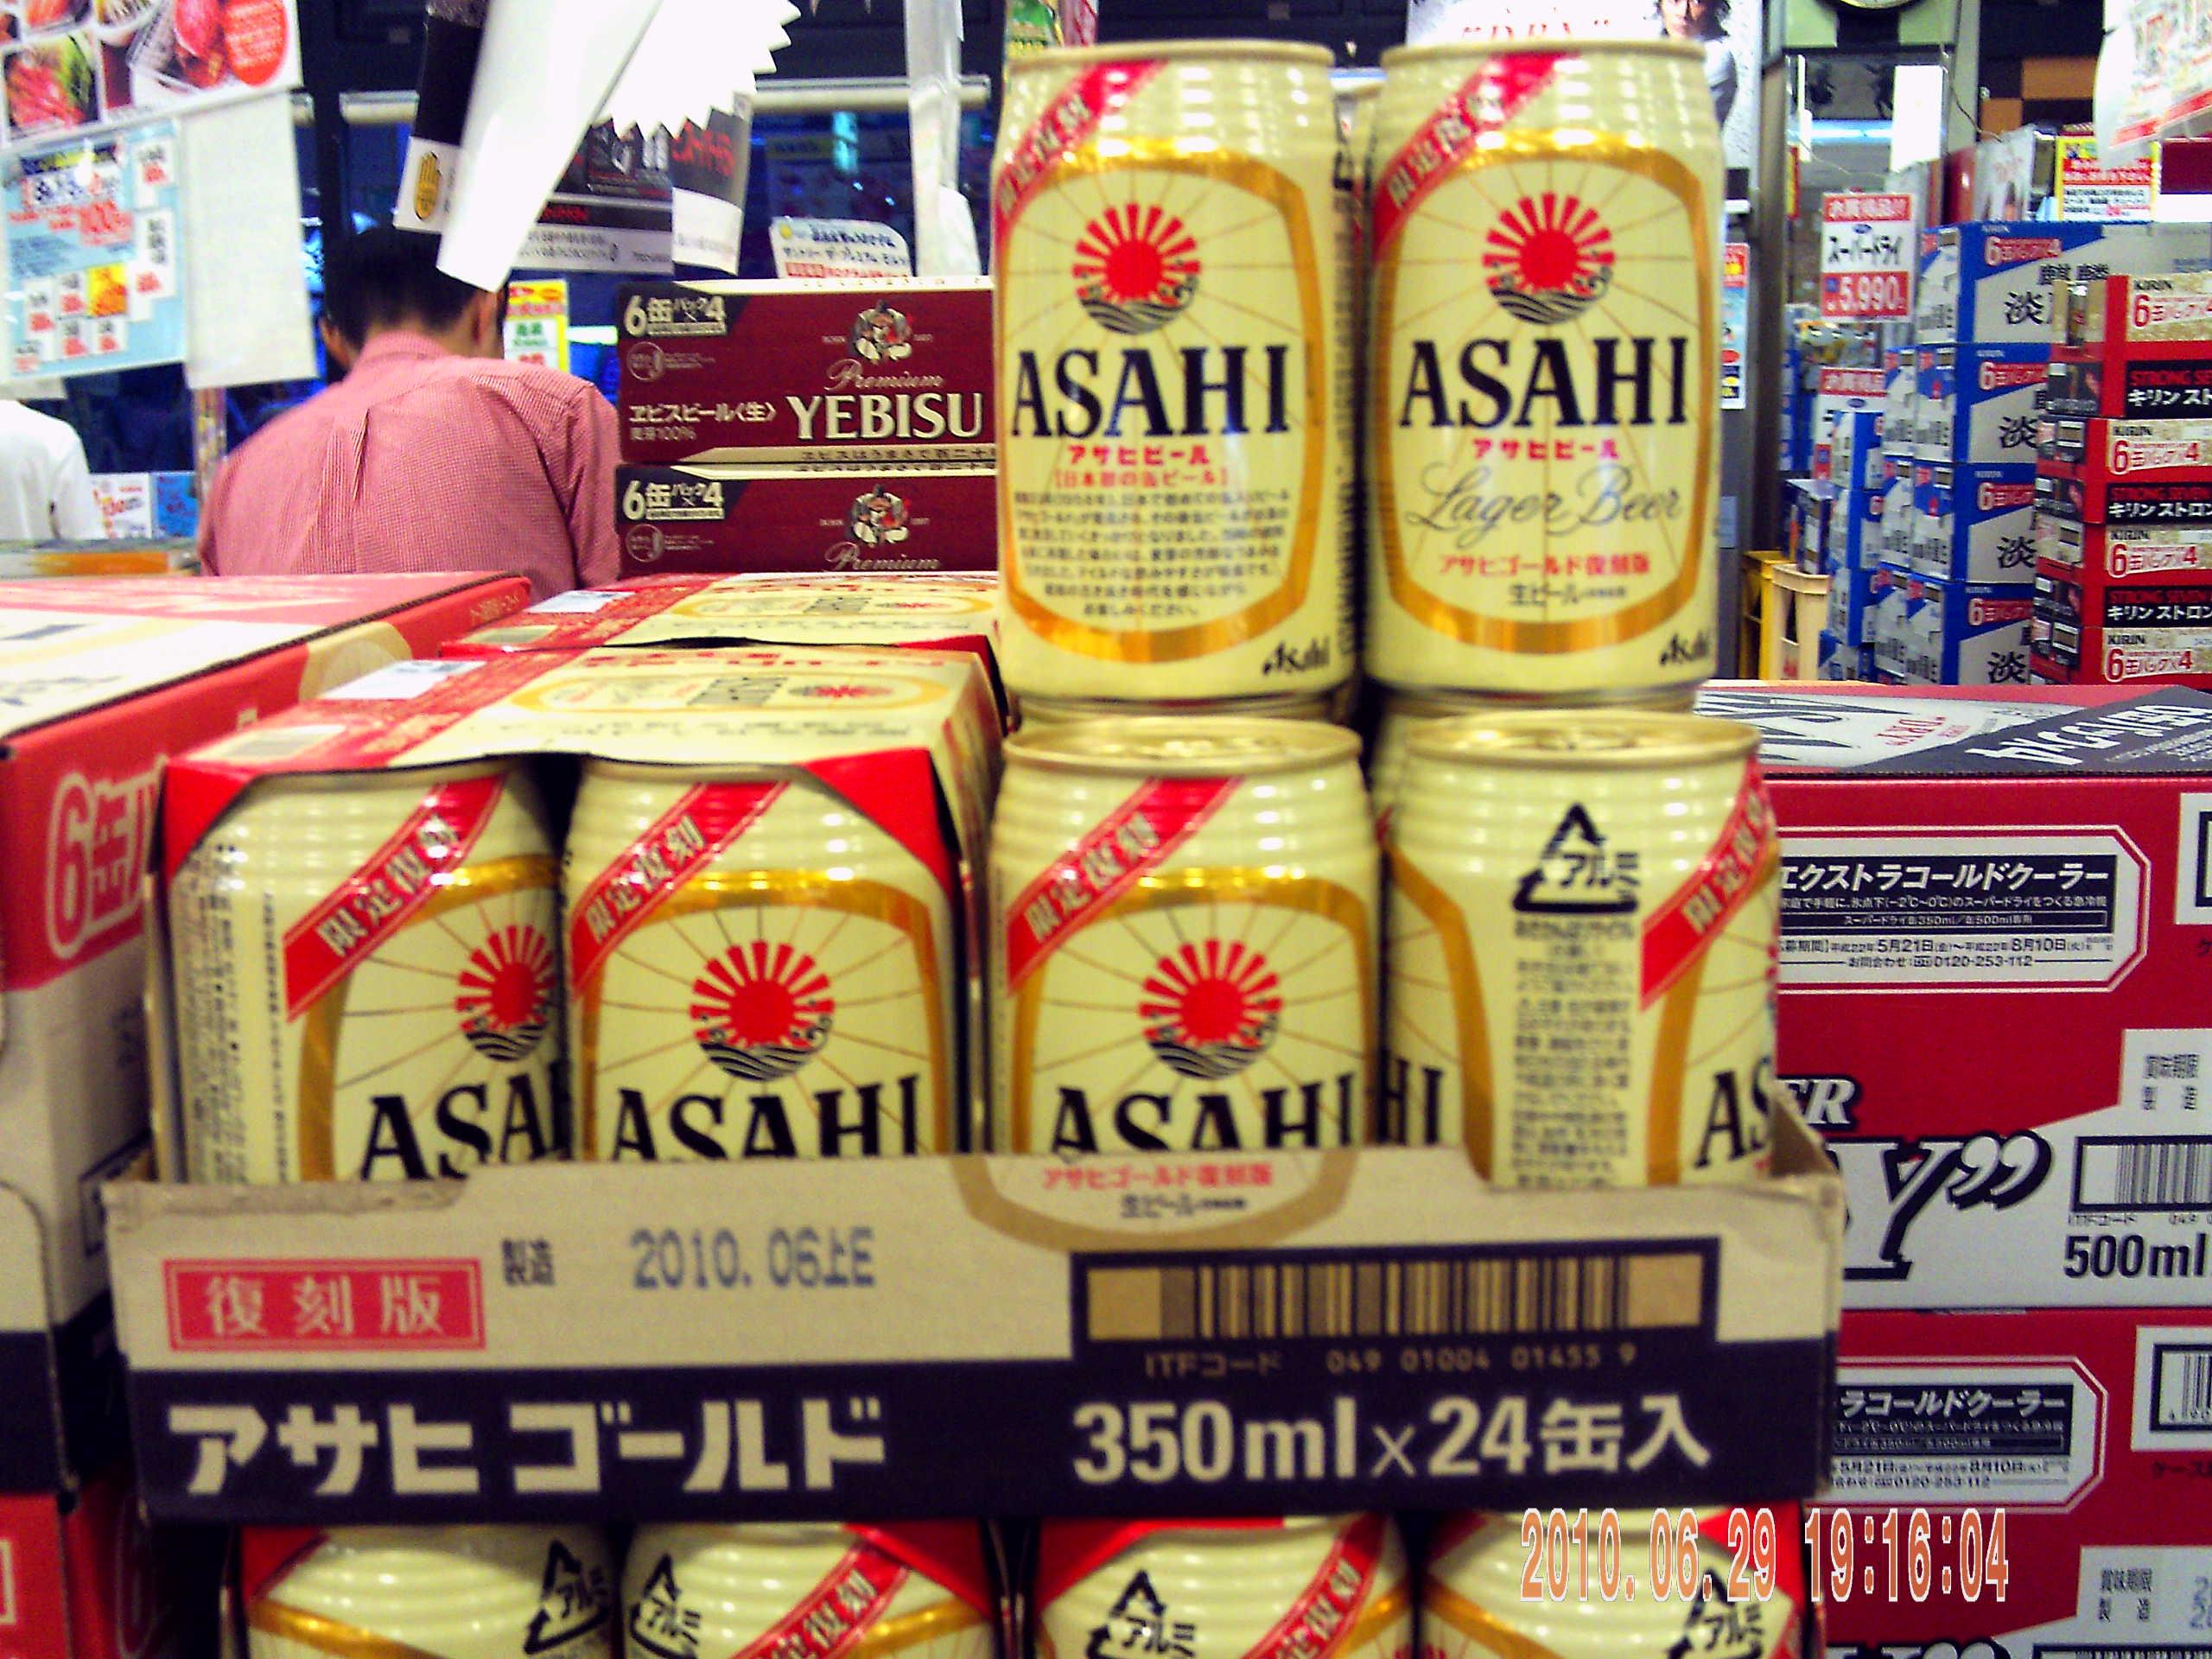 Asahi Gold beer